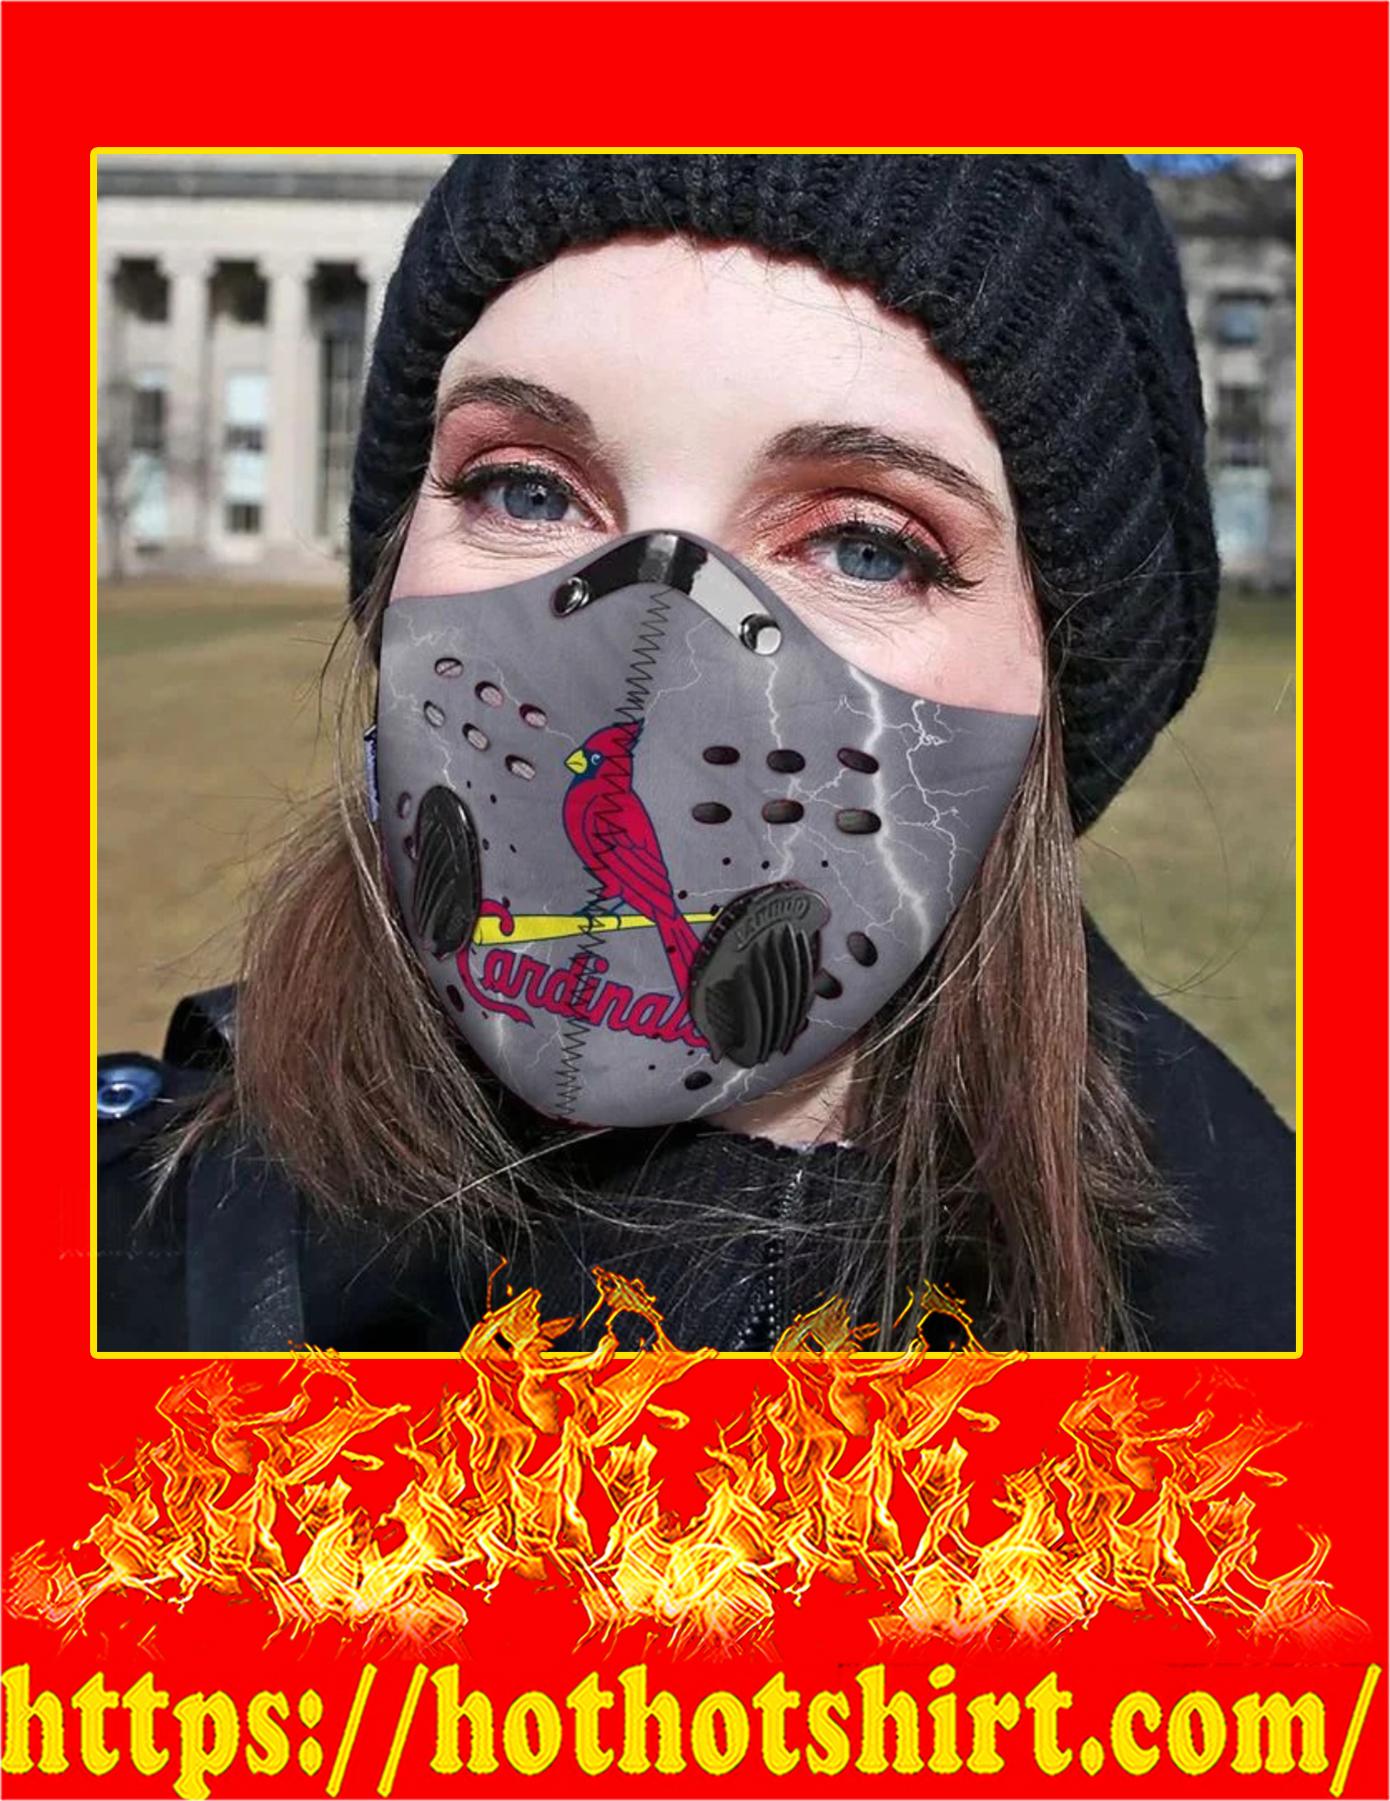 St louis cardinals filter face mask - Pic 2